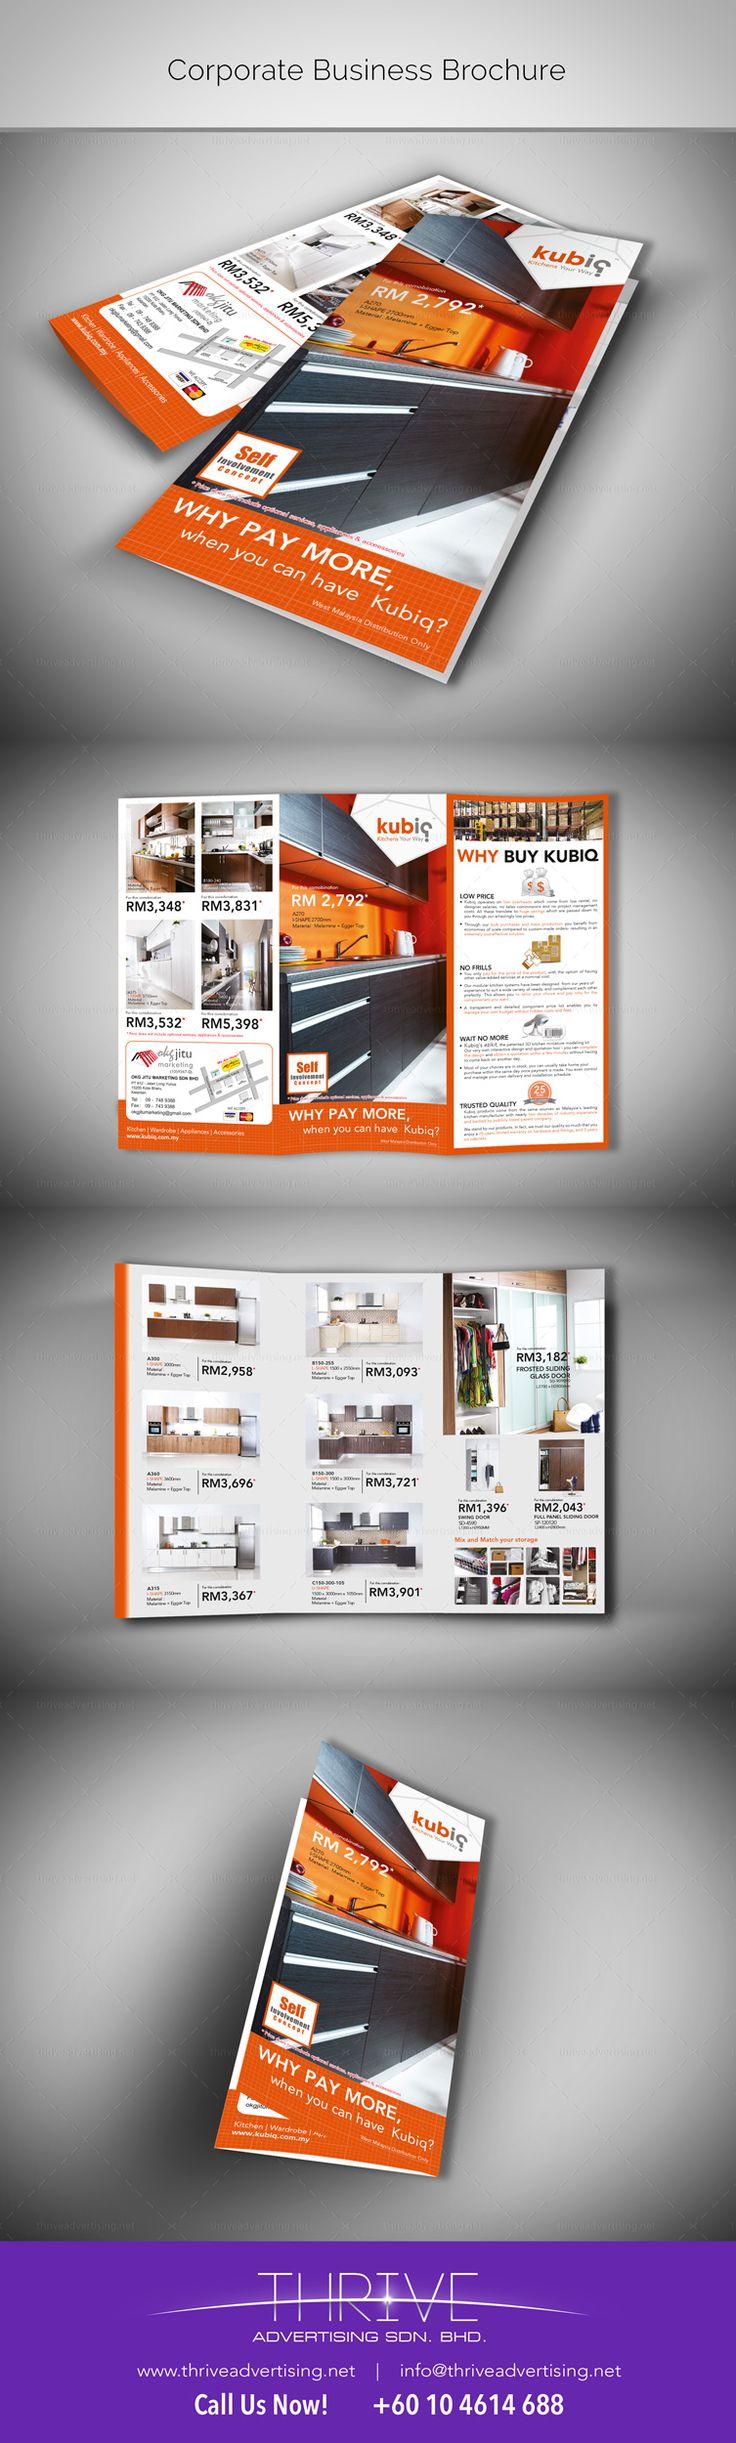 30 best Corporate Brochure Design images on Pinterest | Corporate ...